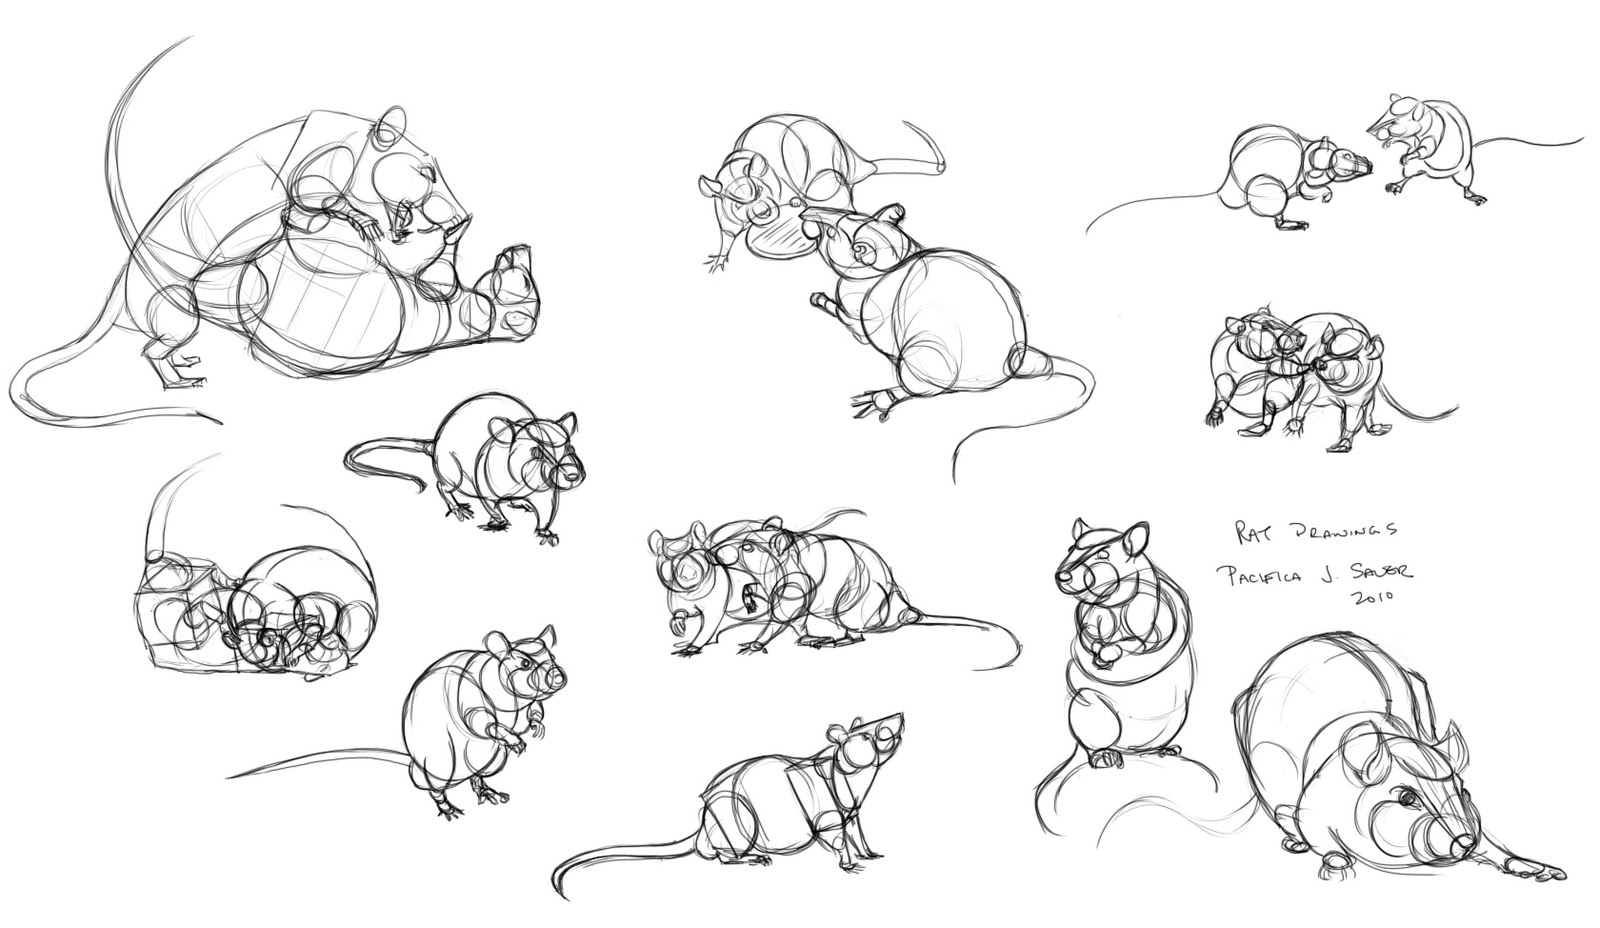 Pacifica J. Sauer: Rats